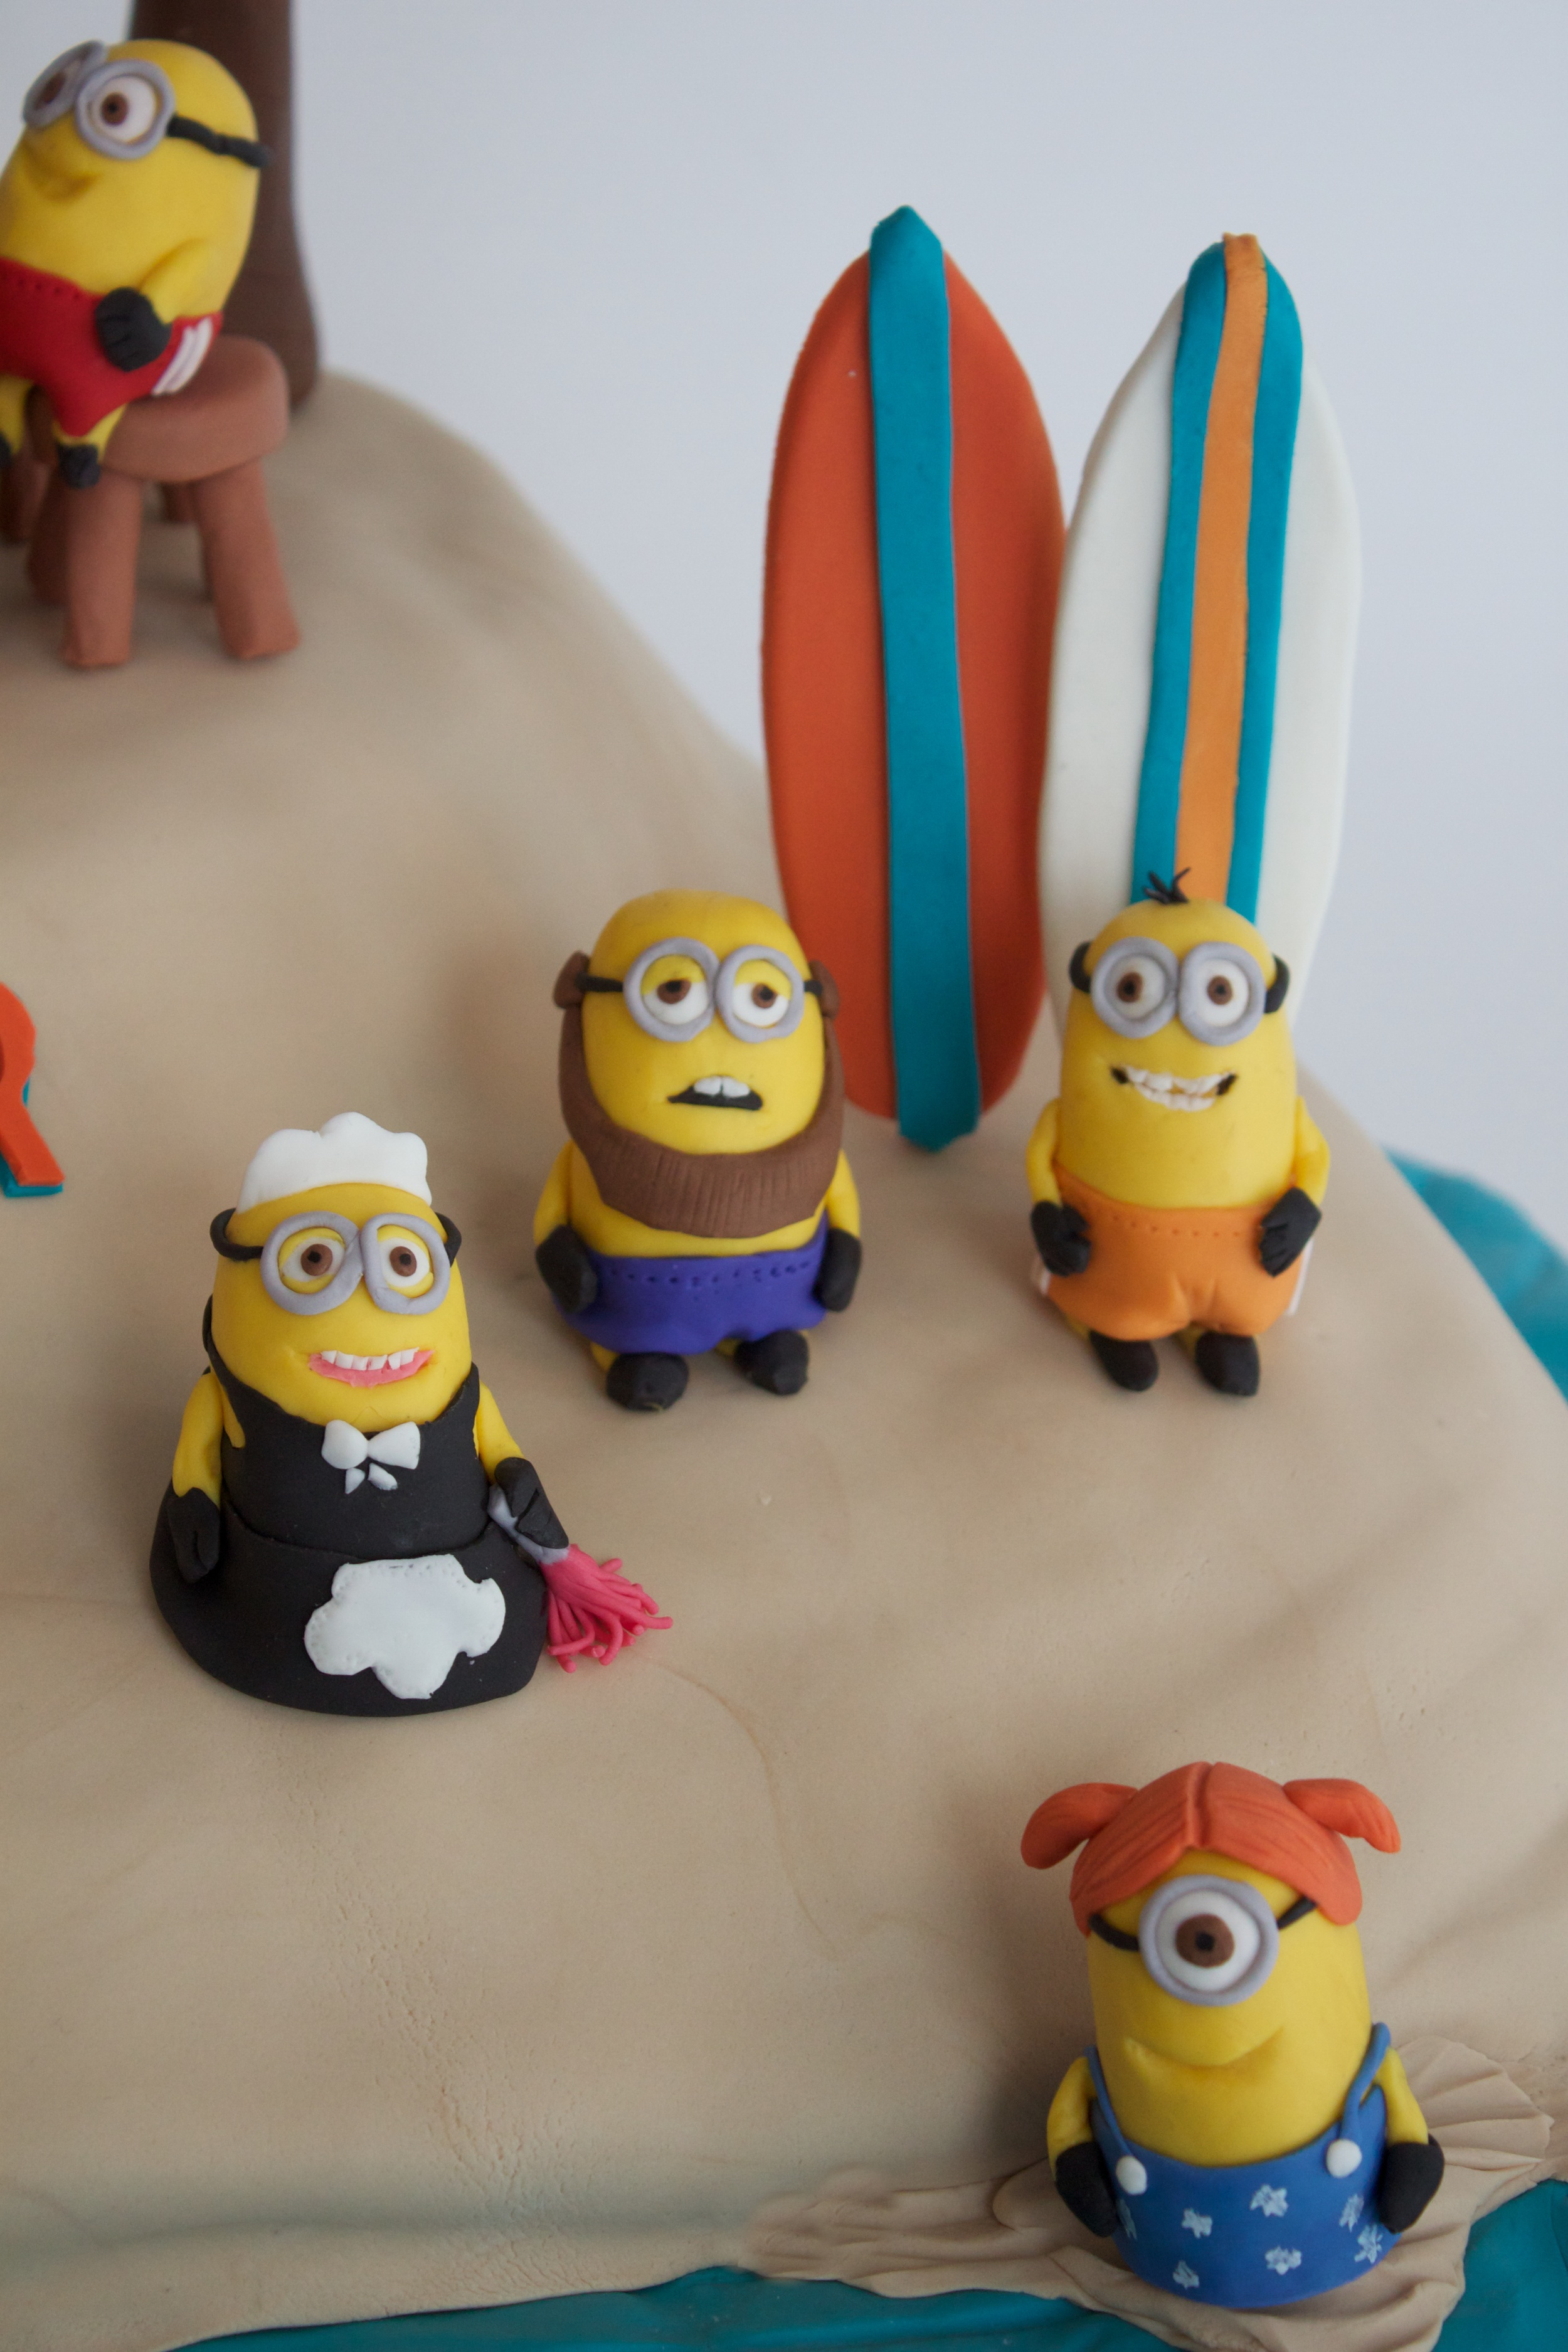 Minion cake close 8035.jpg